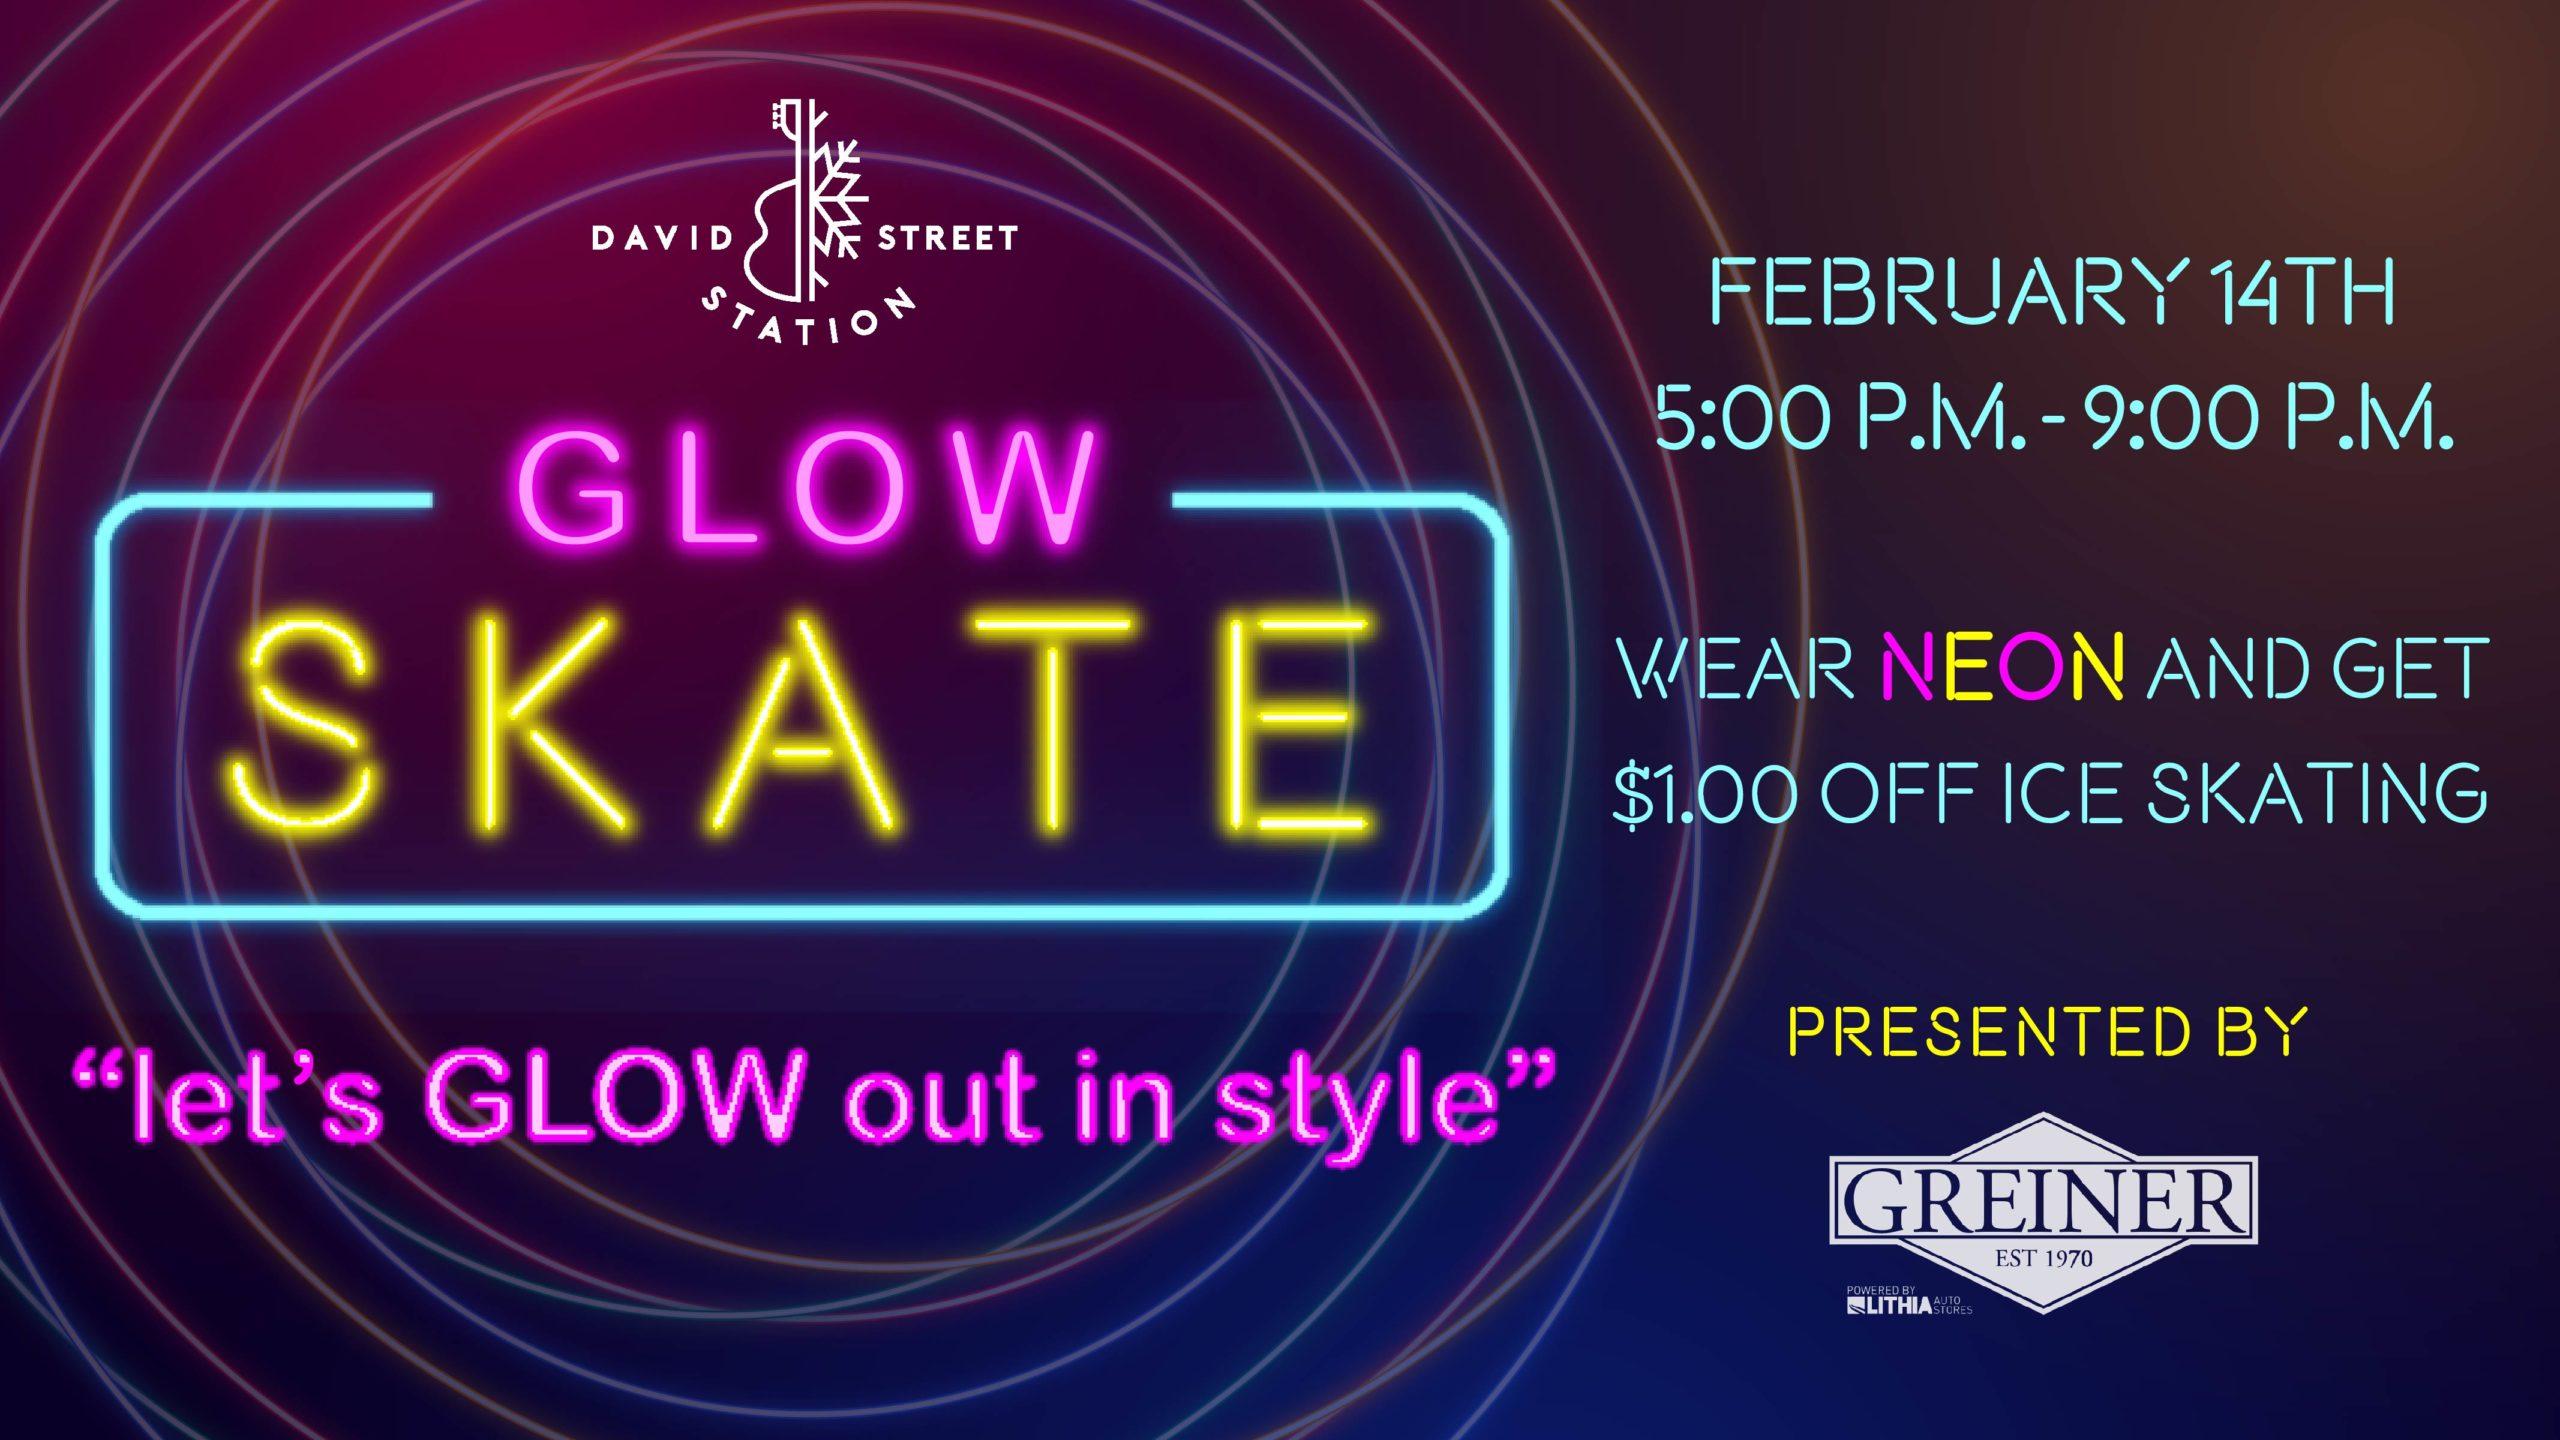 Glow Skate